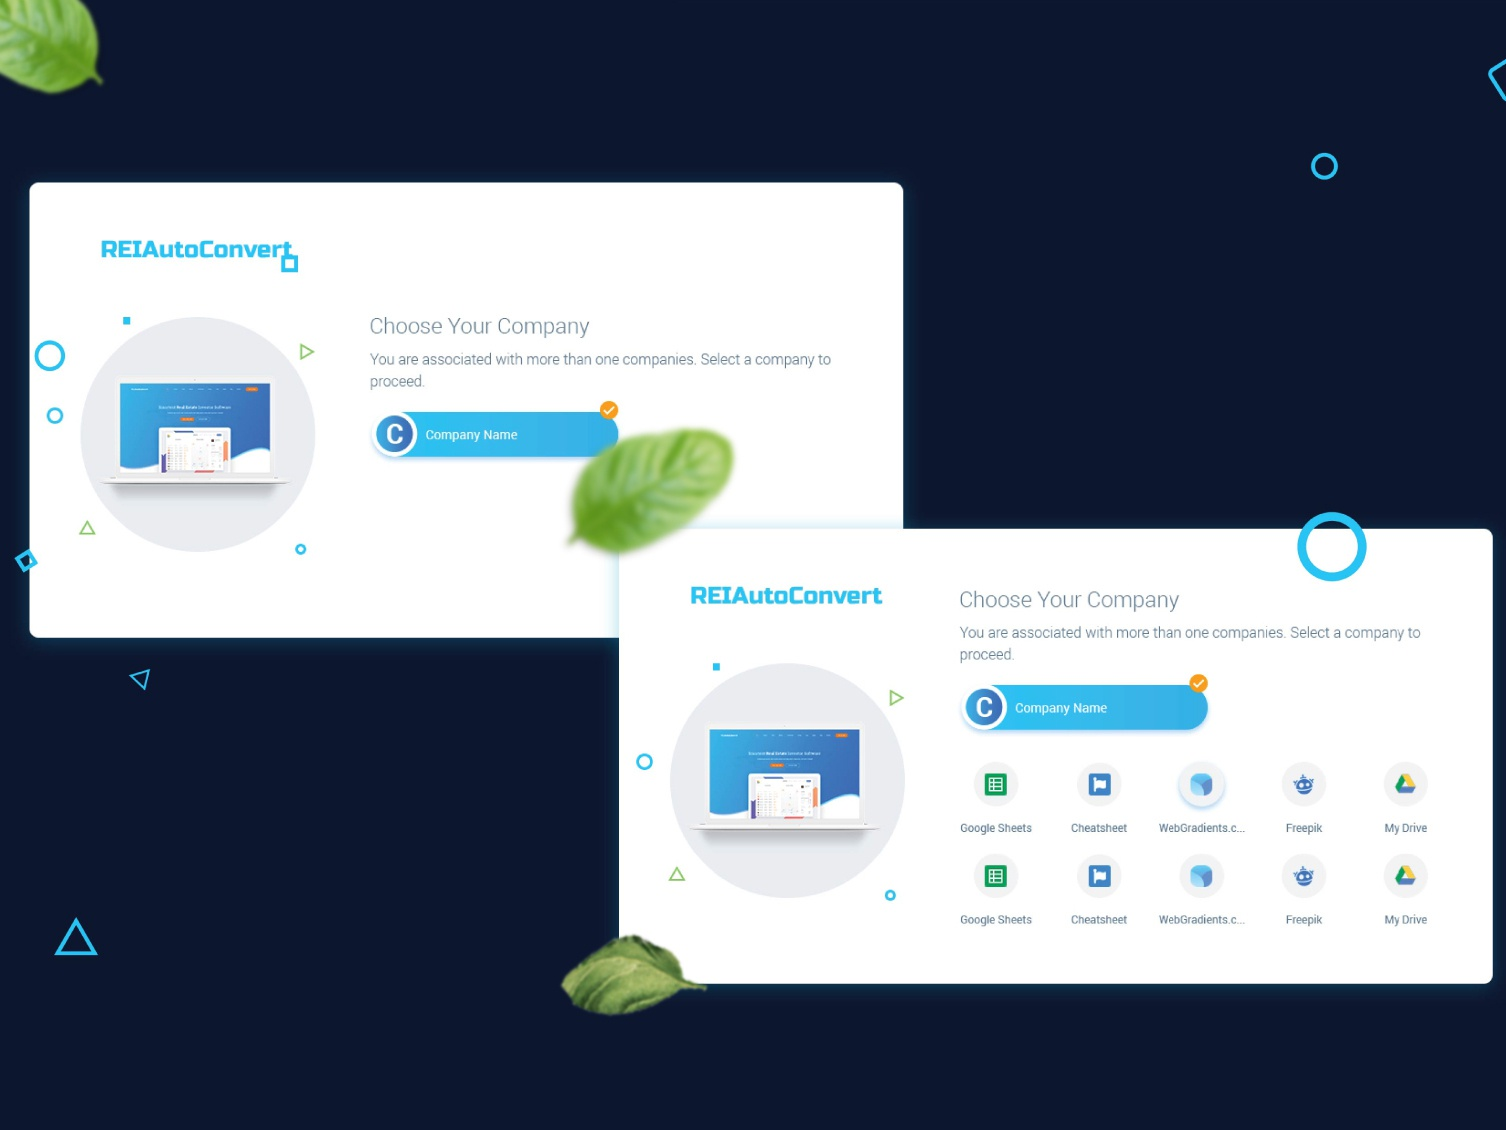 Relautoconvert/Choose Your Company dashboad webdesign website design interface dashboard ui ux ui uxdesign admin dashboard uidesign